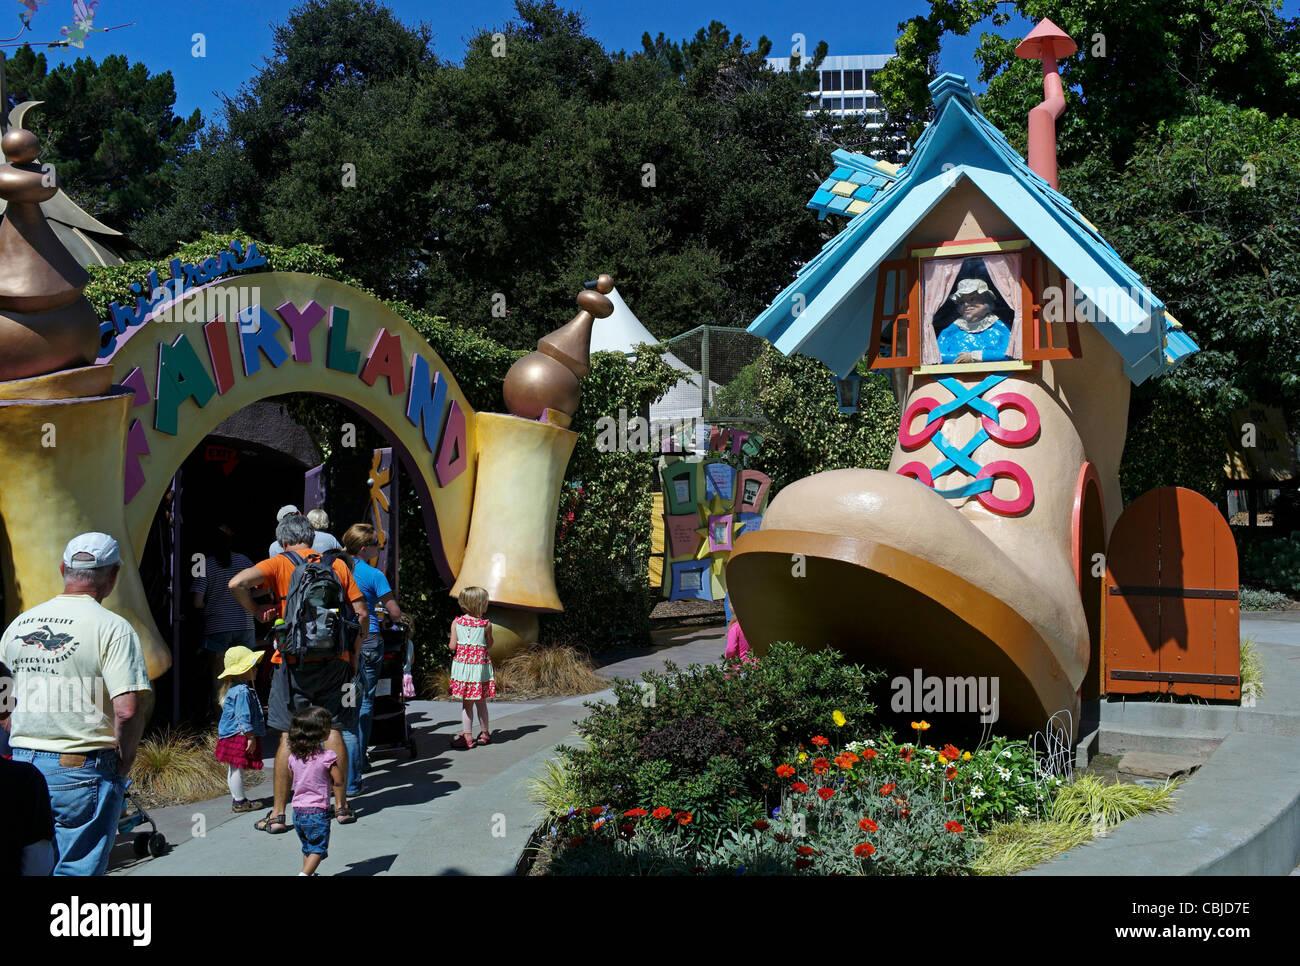 Children's amusement park Fairyland Oakland was the first ...